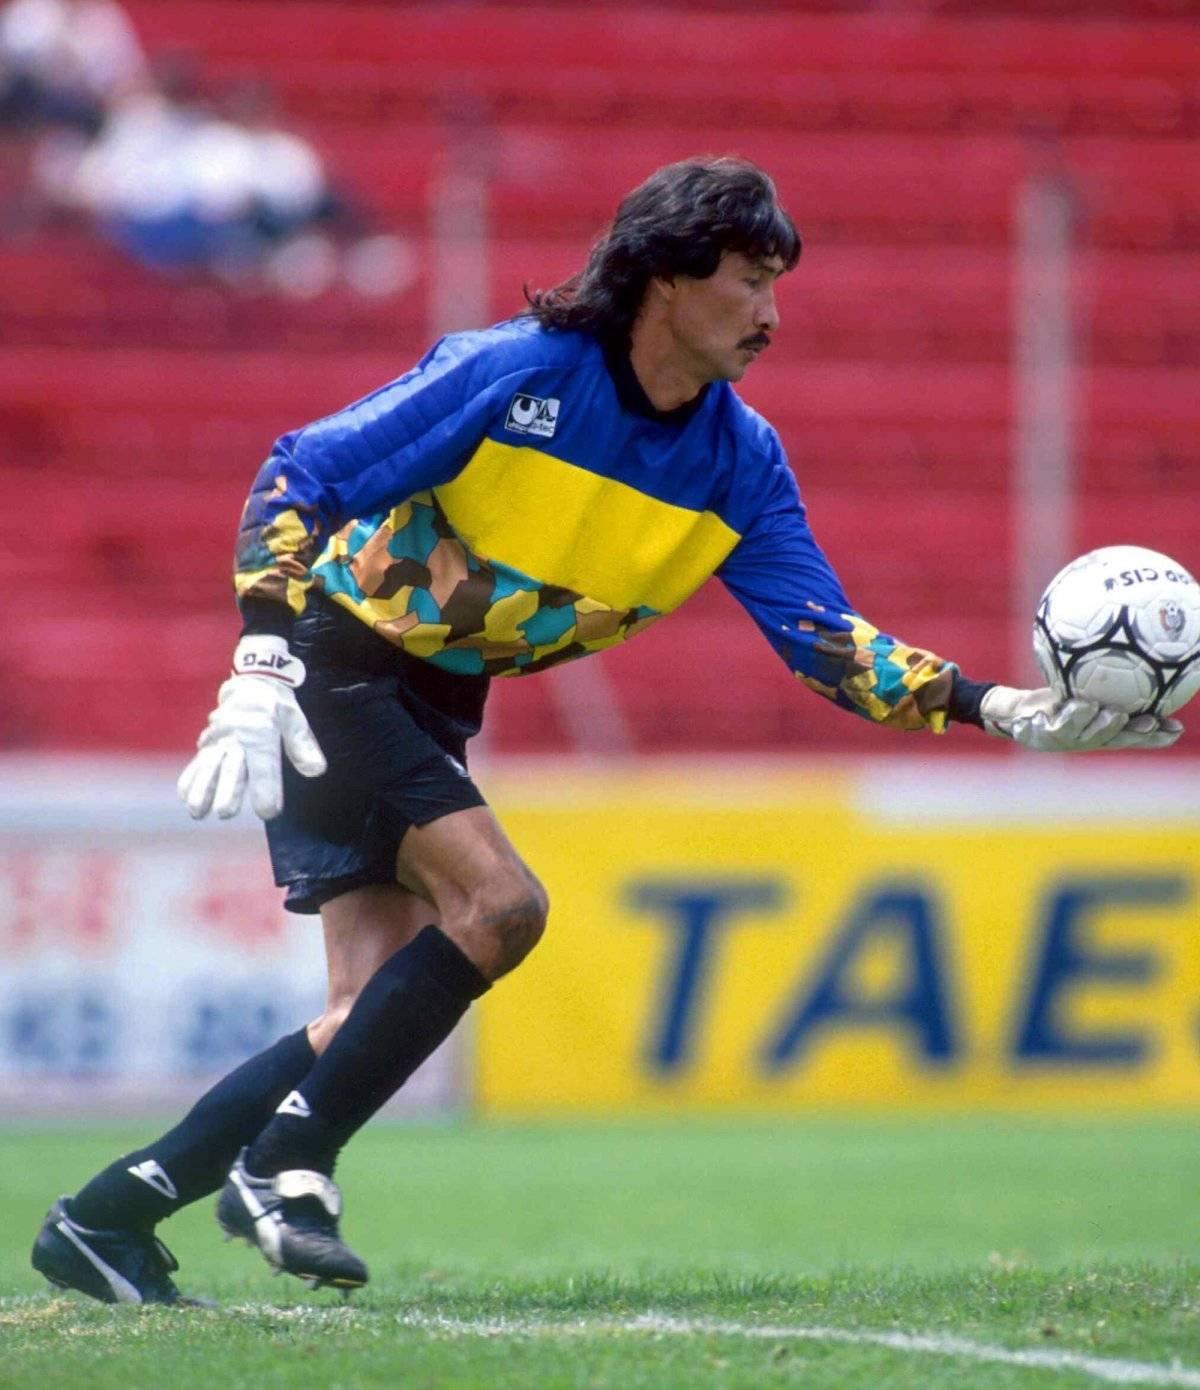 Pablo Larios murió de un infarto  MEXSPORT